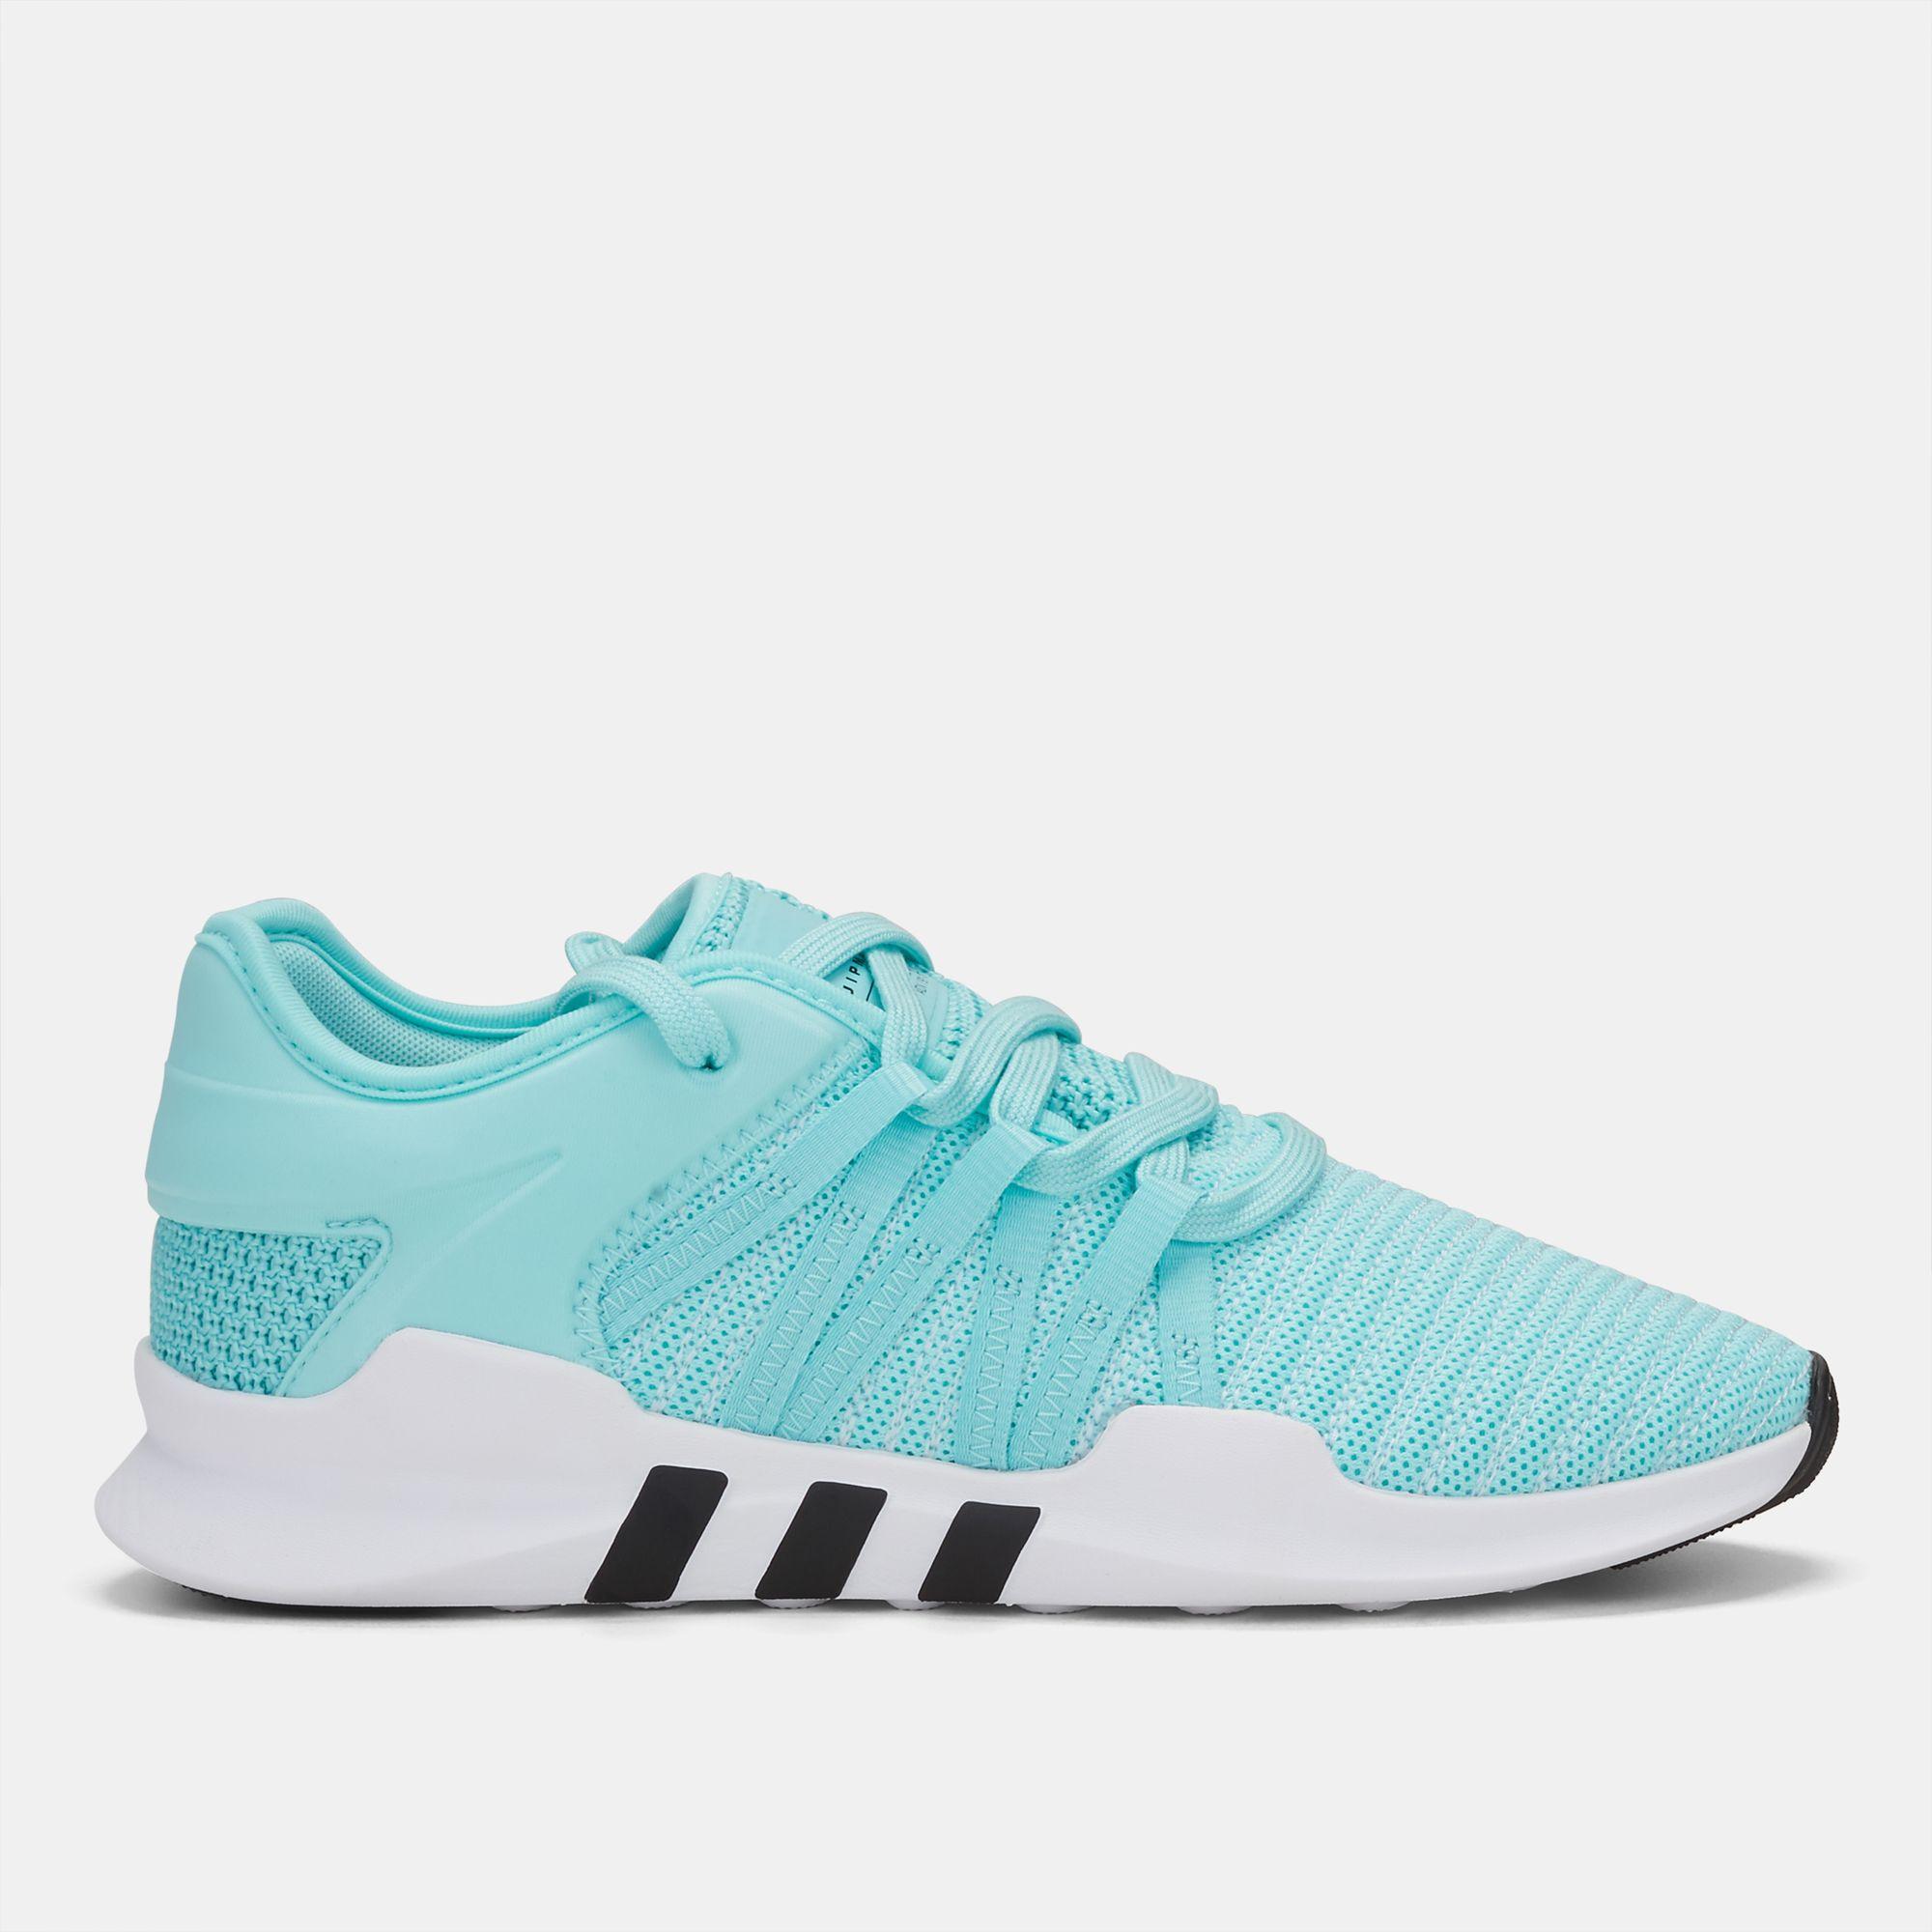 Adidas originali eqt racing avanzata scarpa scarpe scarpe femminili